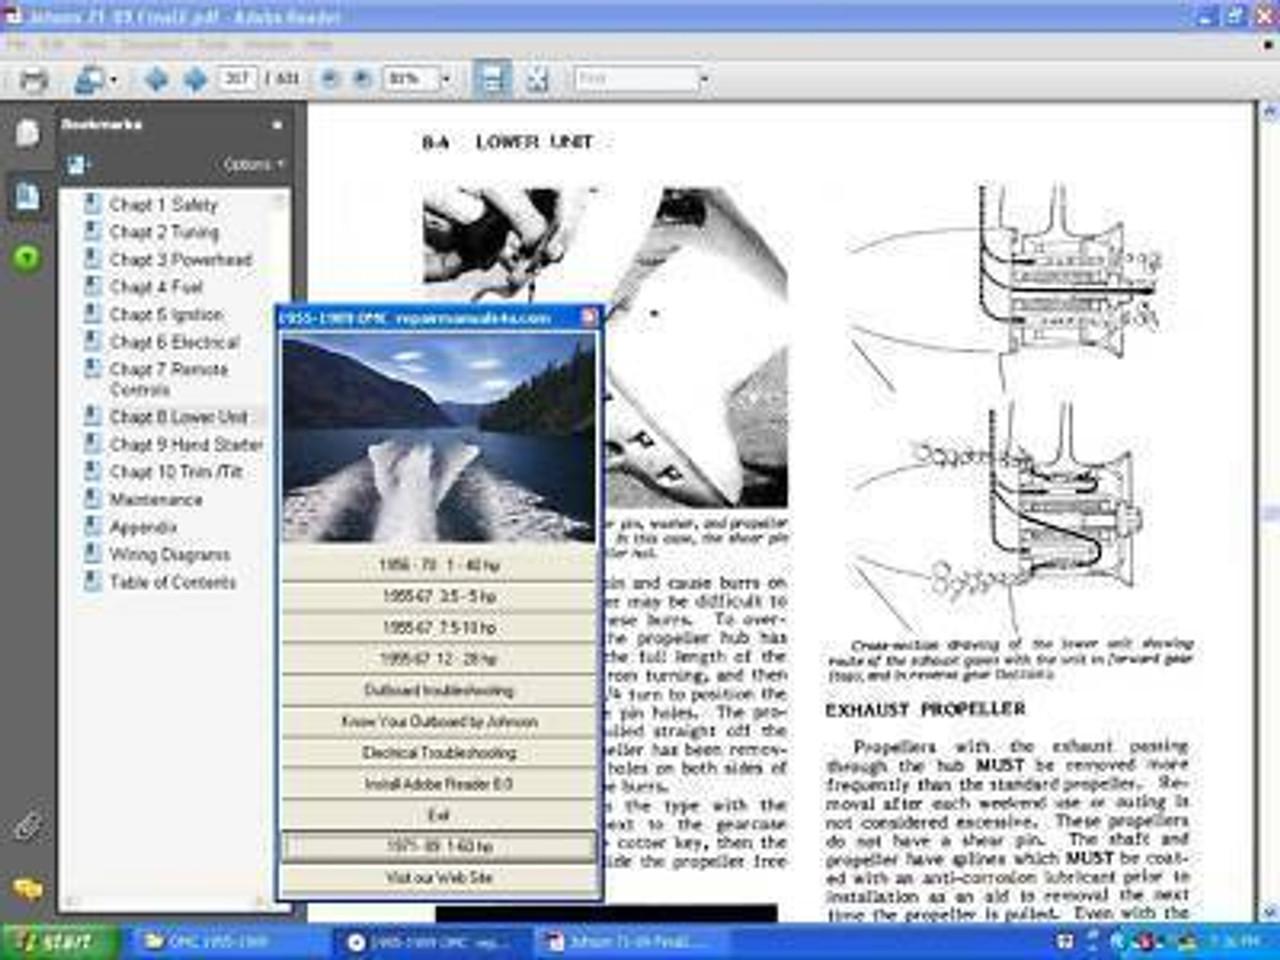 Sea rayder n bayliner razz jet boat service repair manual 120xr2.